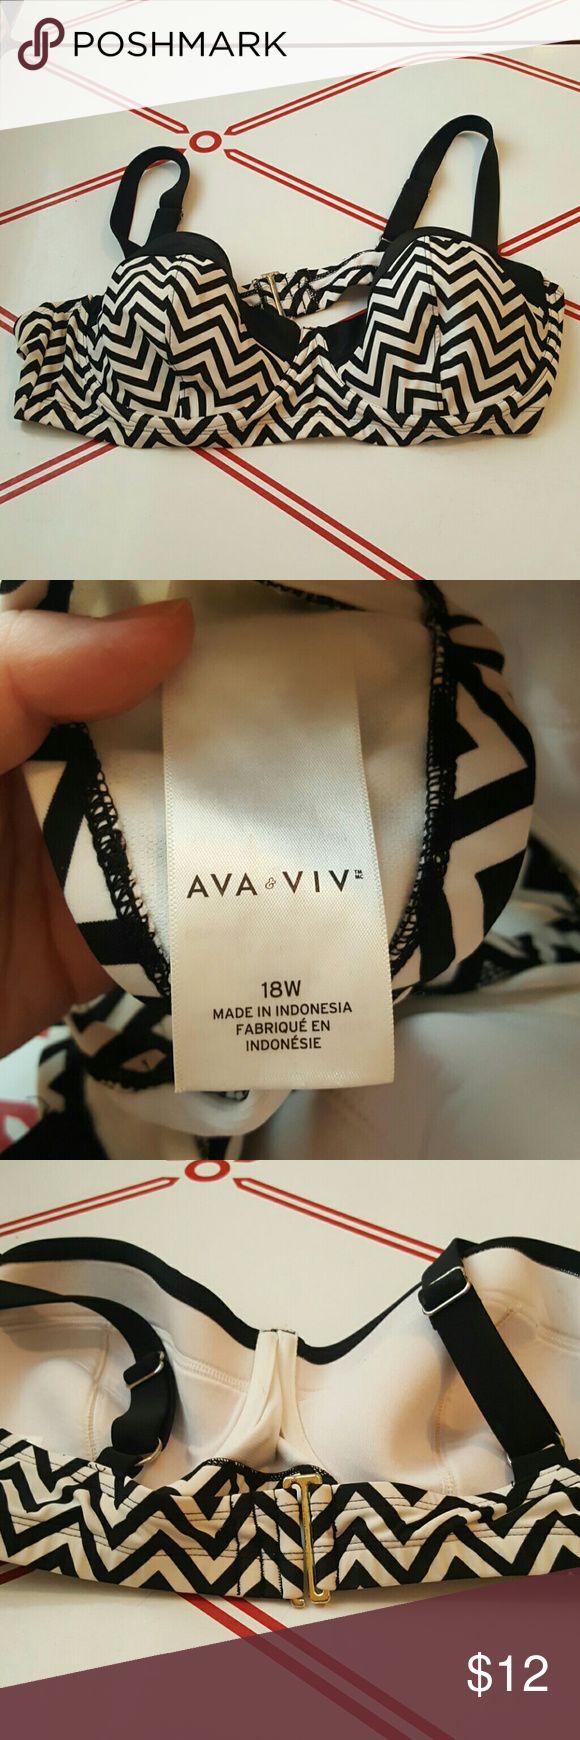 Ava & VIV chevron bikini top! Cute black and white chevron bikini top from Ava & Viv (Target plus) in size 18W Ava & Viv  Swim Bikinis